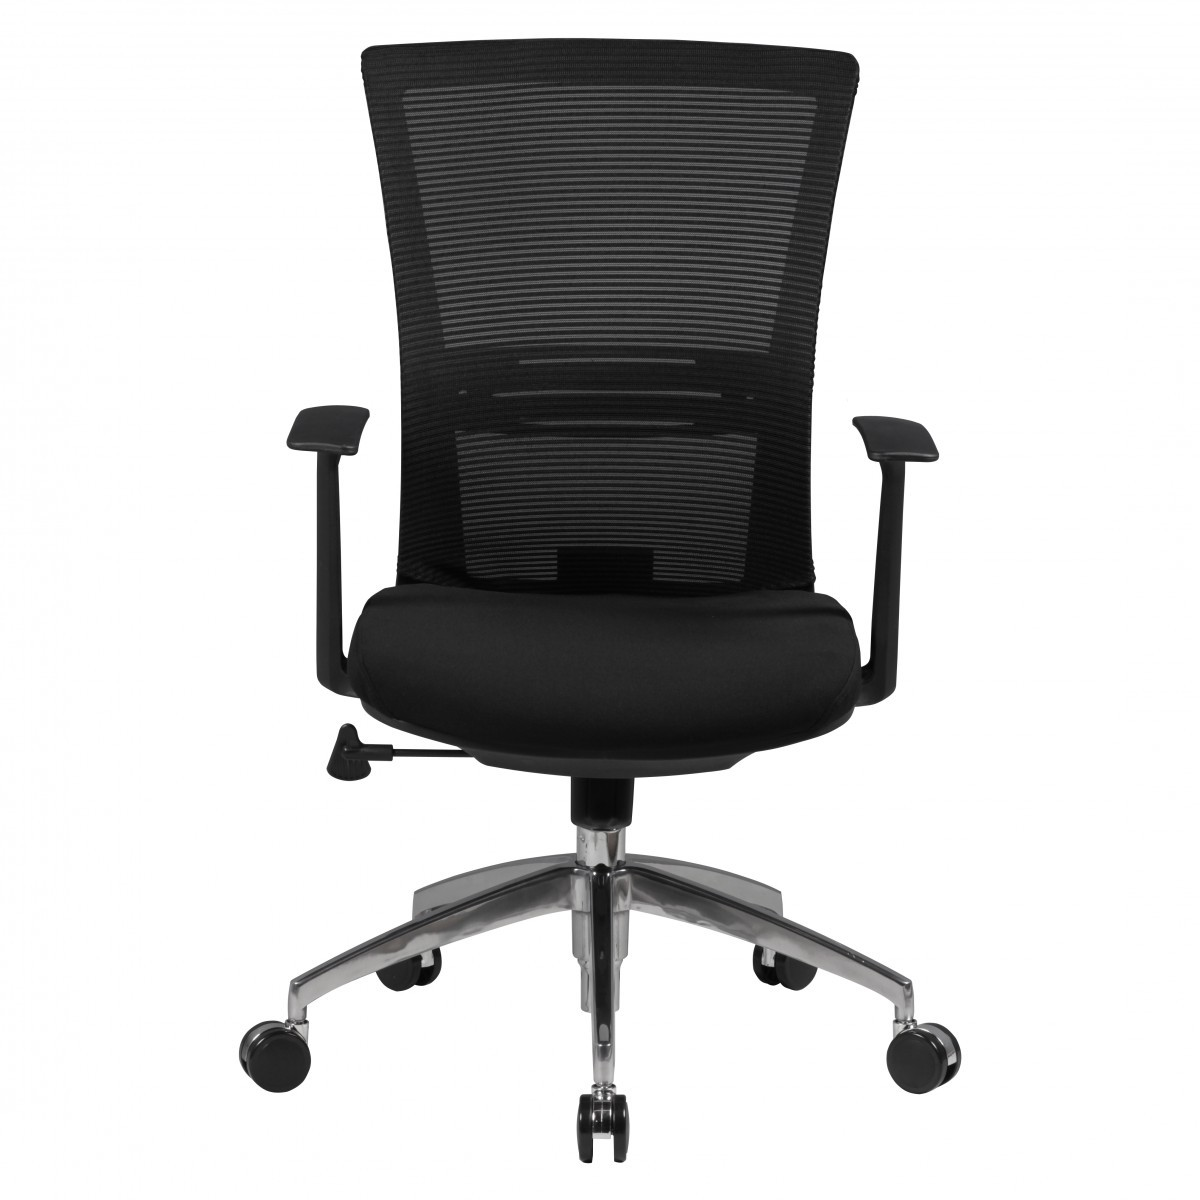 Neu Bürostuhl Drehstuhl Bürodrehstuhl Schreibtischstuhl 55x63 cm Schwarz Y8J0